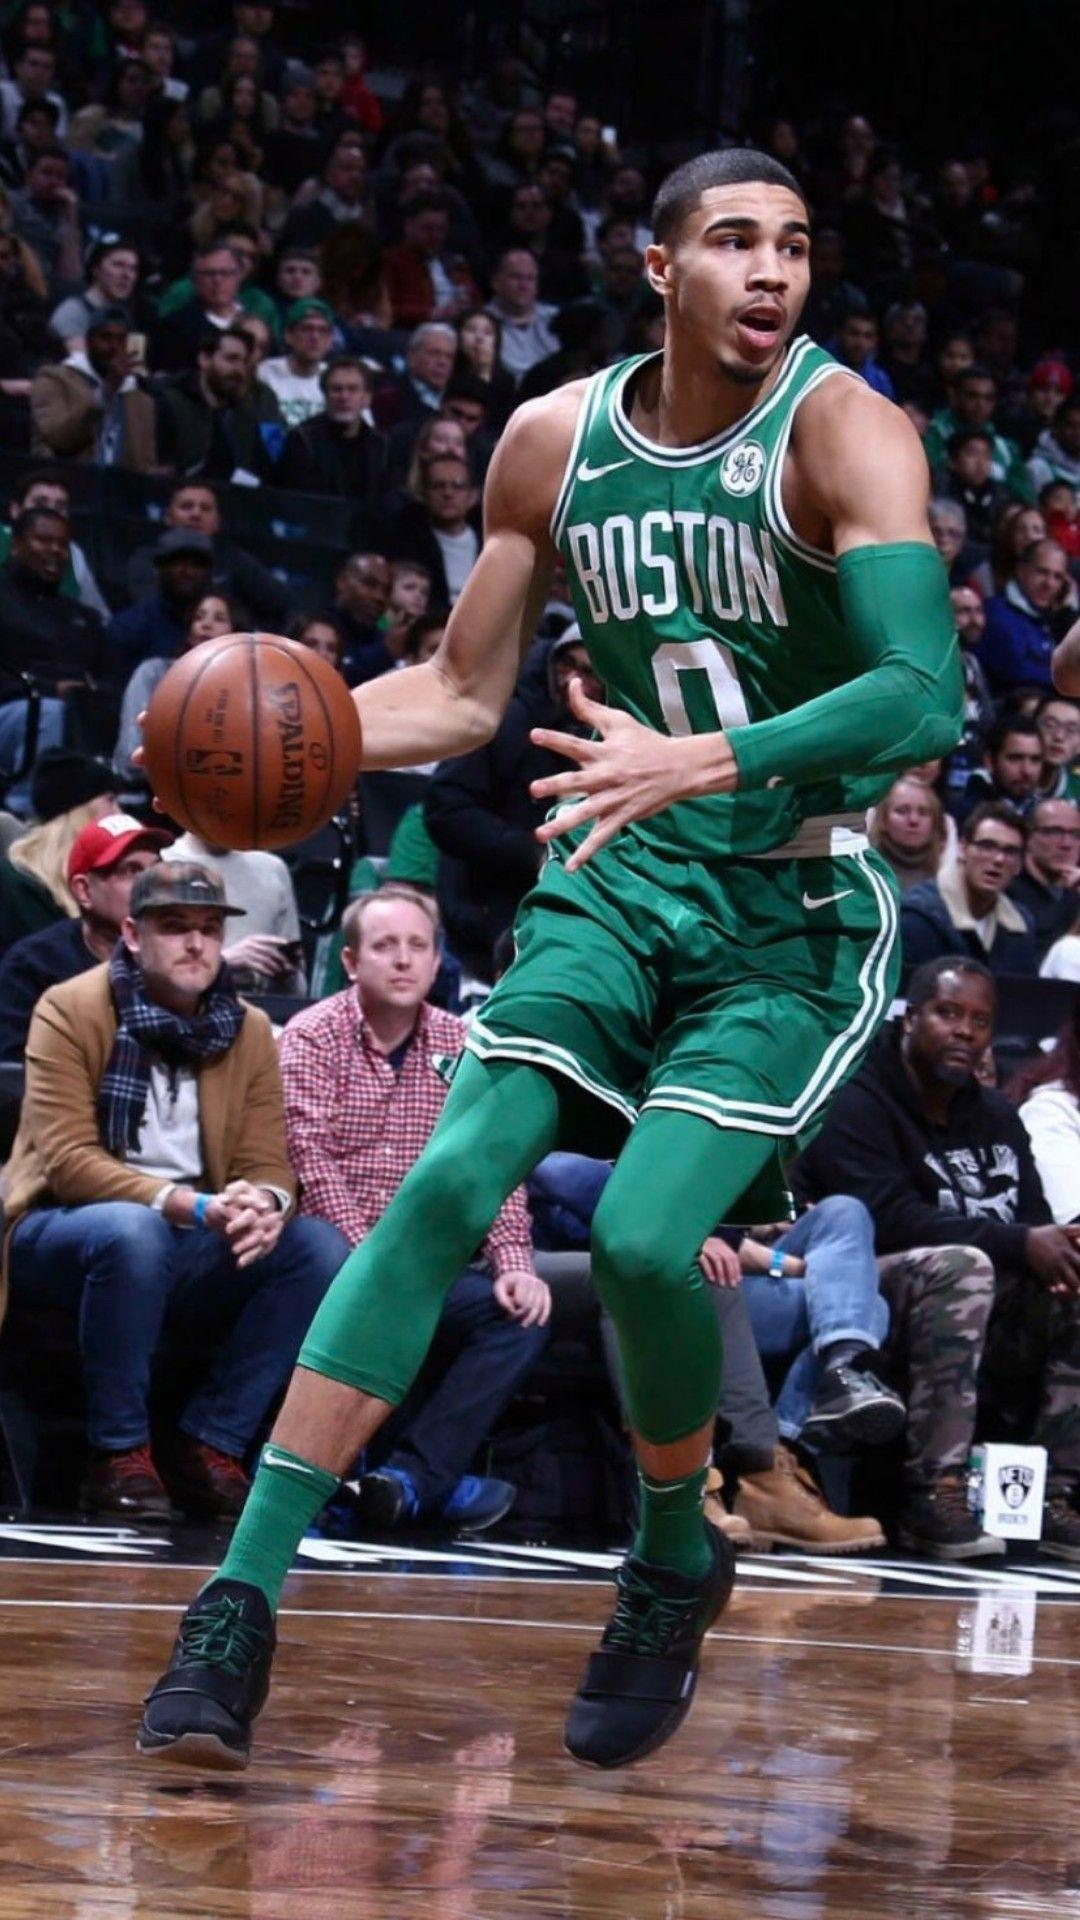 Jayson Tatum Wallpaper Nba Fashion Boston Celtics Boston Celtics Basketball